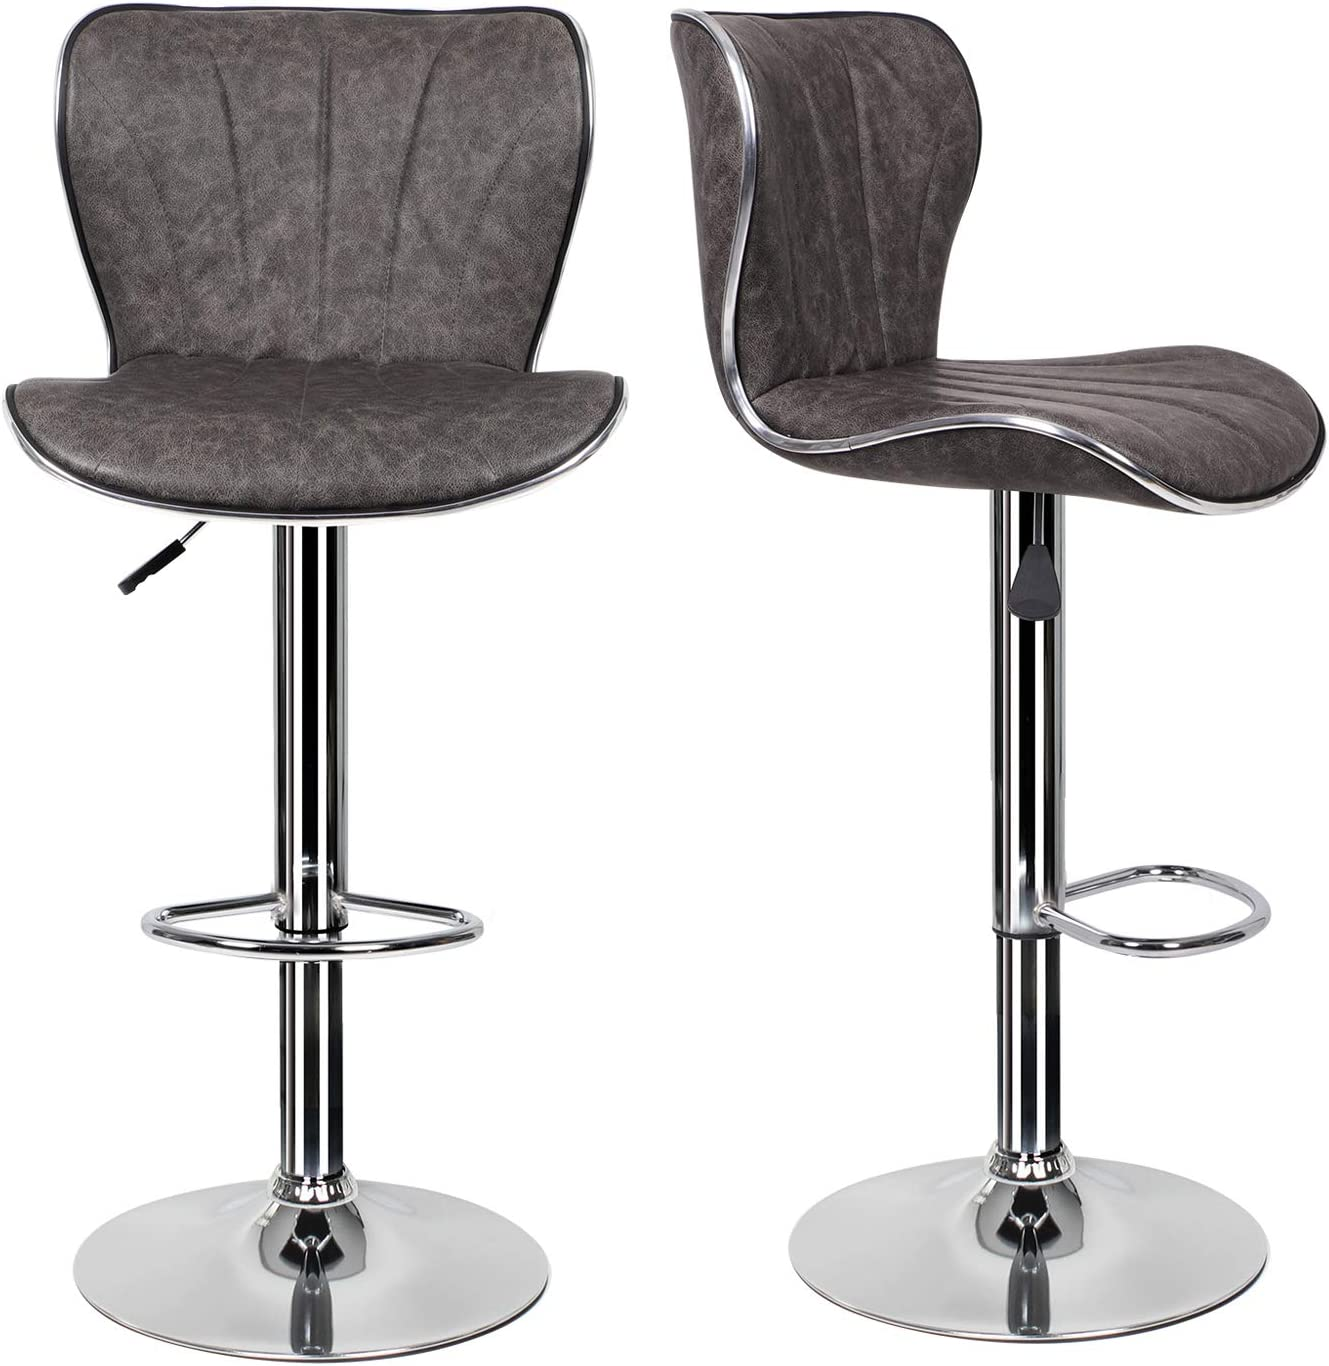 EUCO 9 pcs Grey Bar Stool,Kitchen Bar Stool Swivel Gas Lift Breakfast Bar  Stool with Padded Backrest&Chrome Footrest High Dining Stools Bar ...